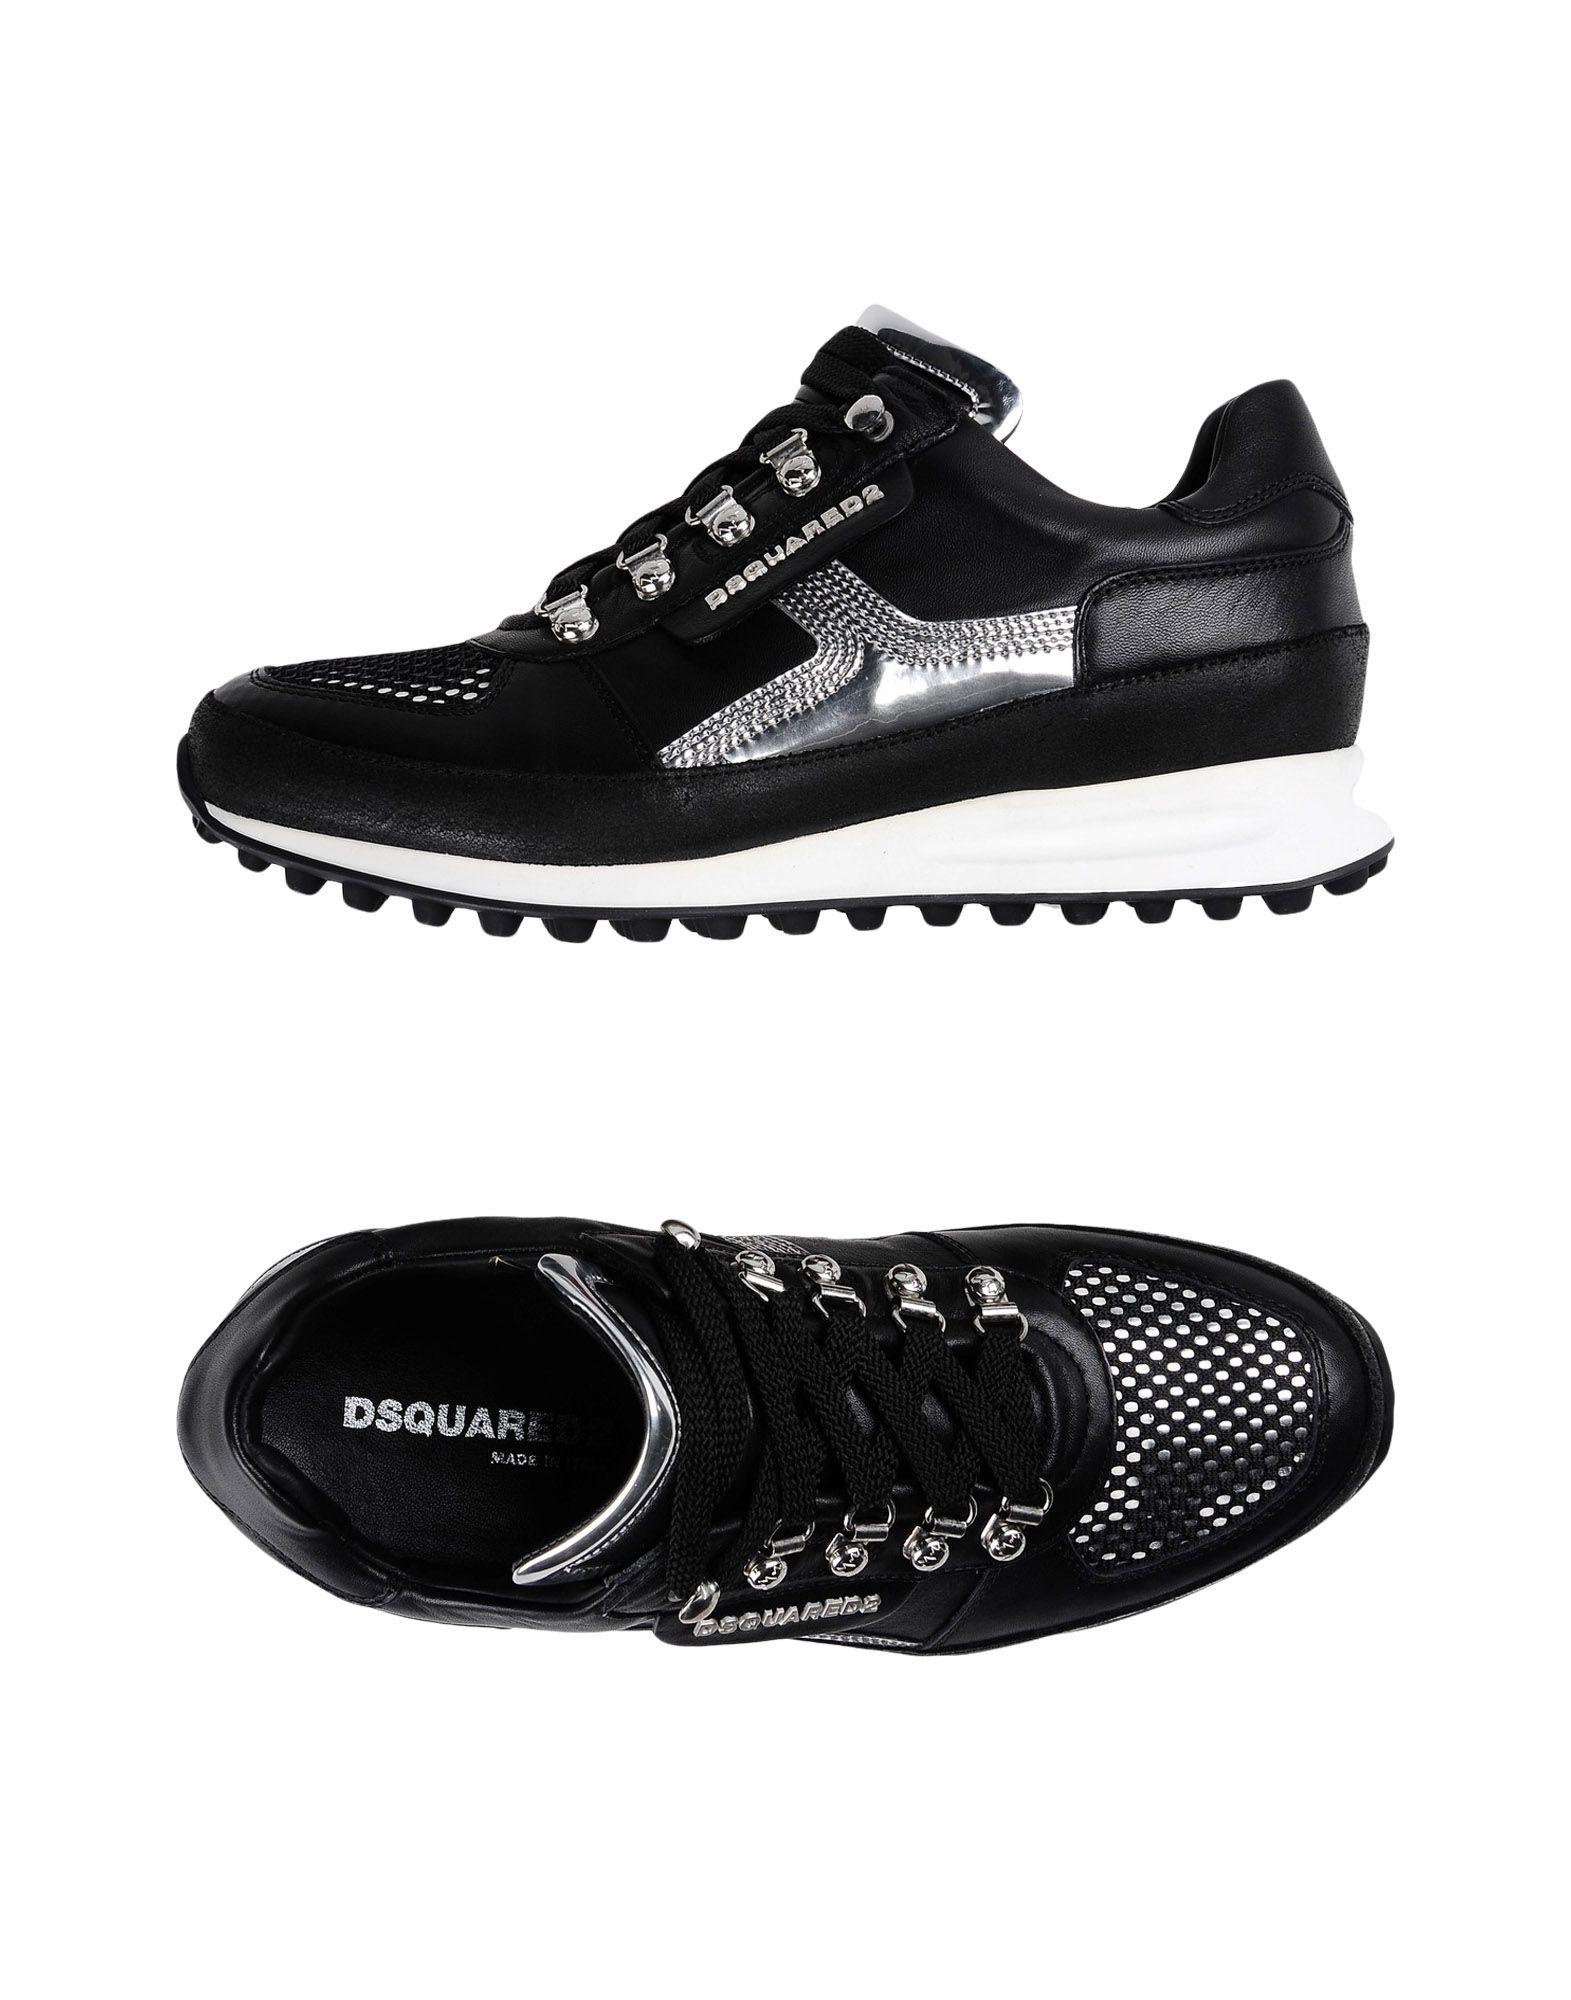 Dsquared2 Sneakers Herren  11411453PQ Gute Qualität beliebte Schuhe